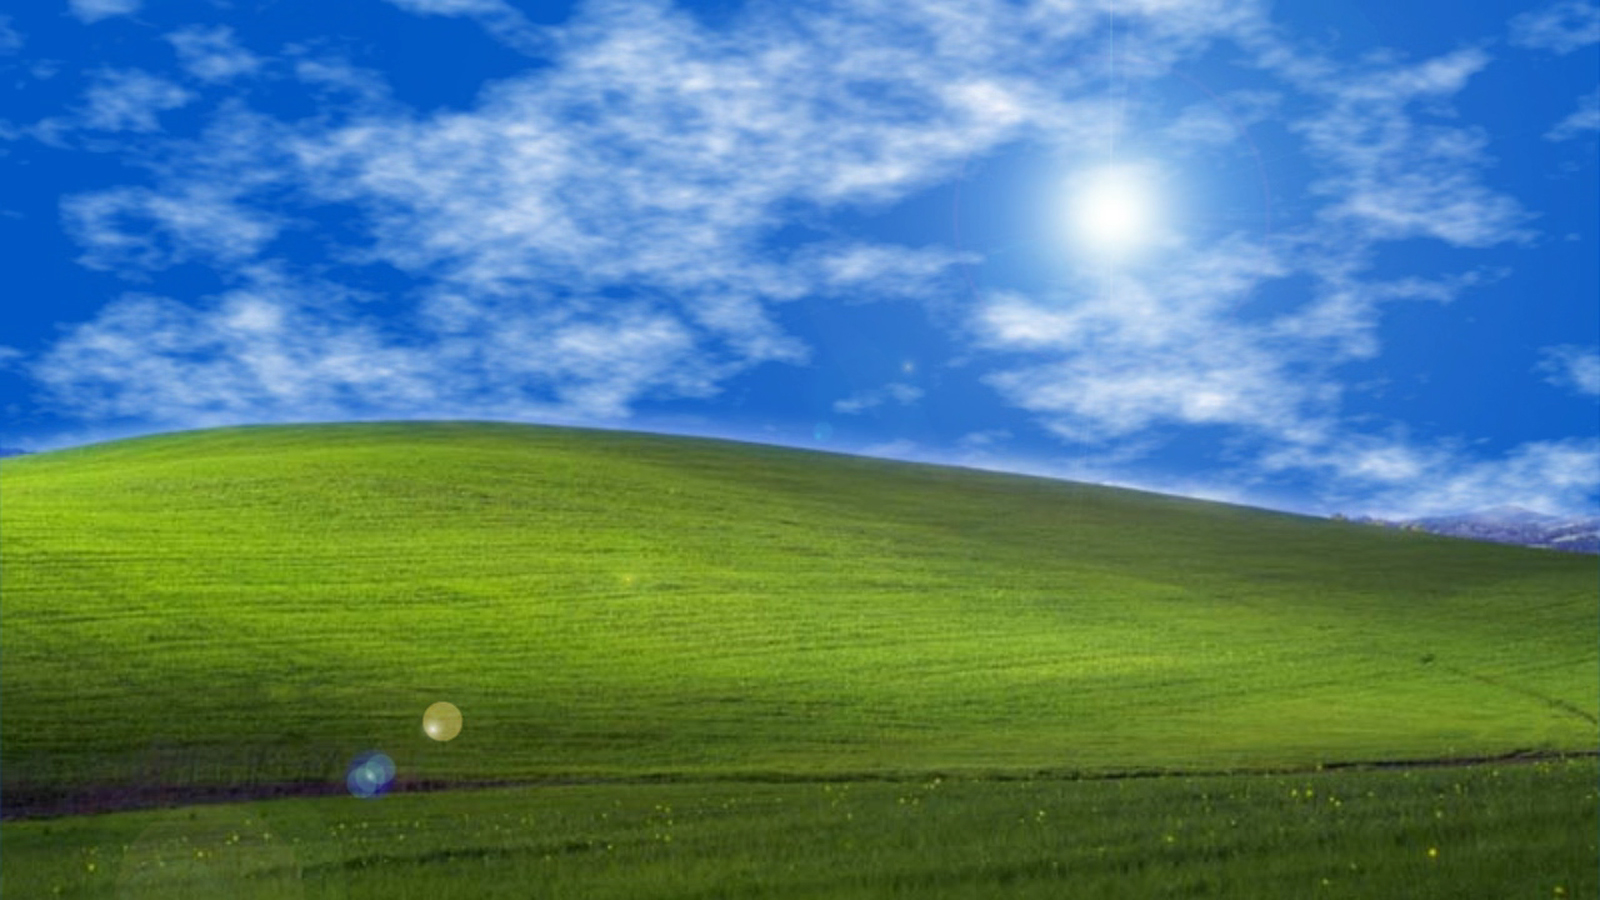 Gallery download free dreamscenes for Window xp wallpaper